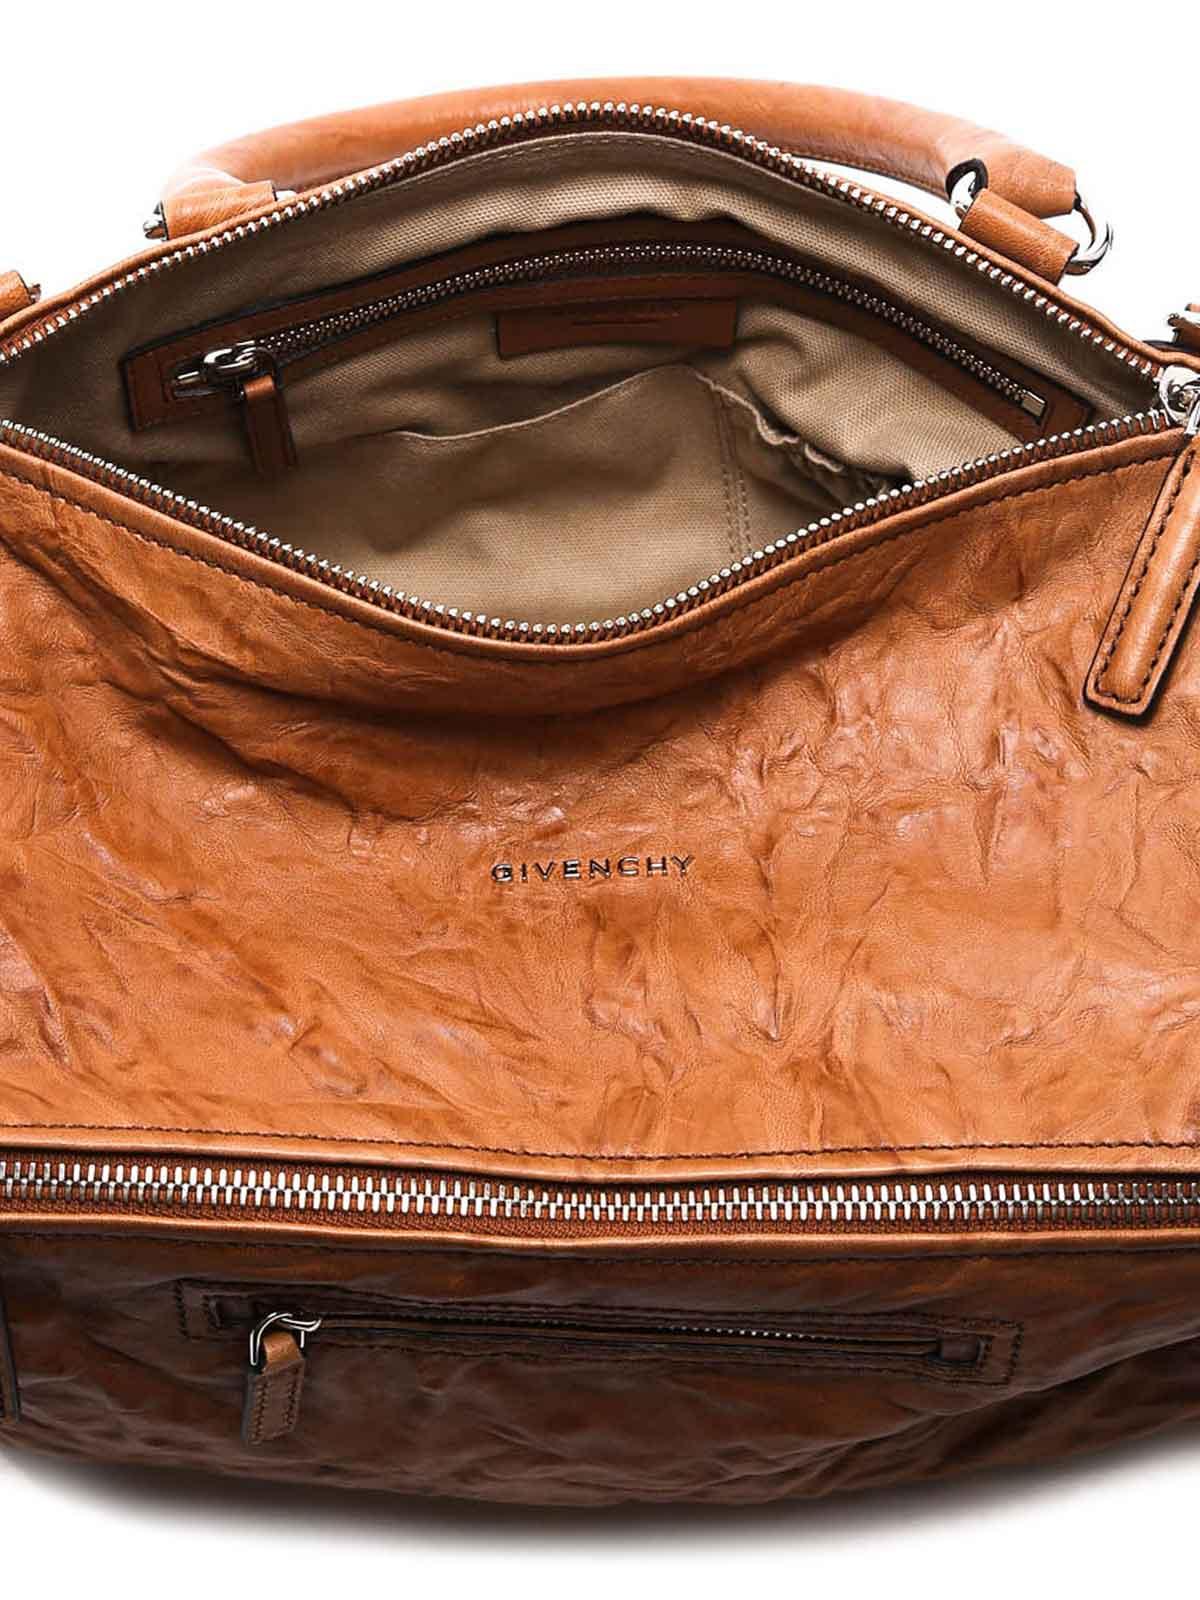 0278b010829b Givenchy - Pandora medium leather bag - shoulder bags - BB05250004235